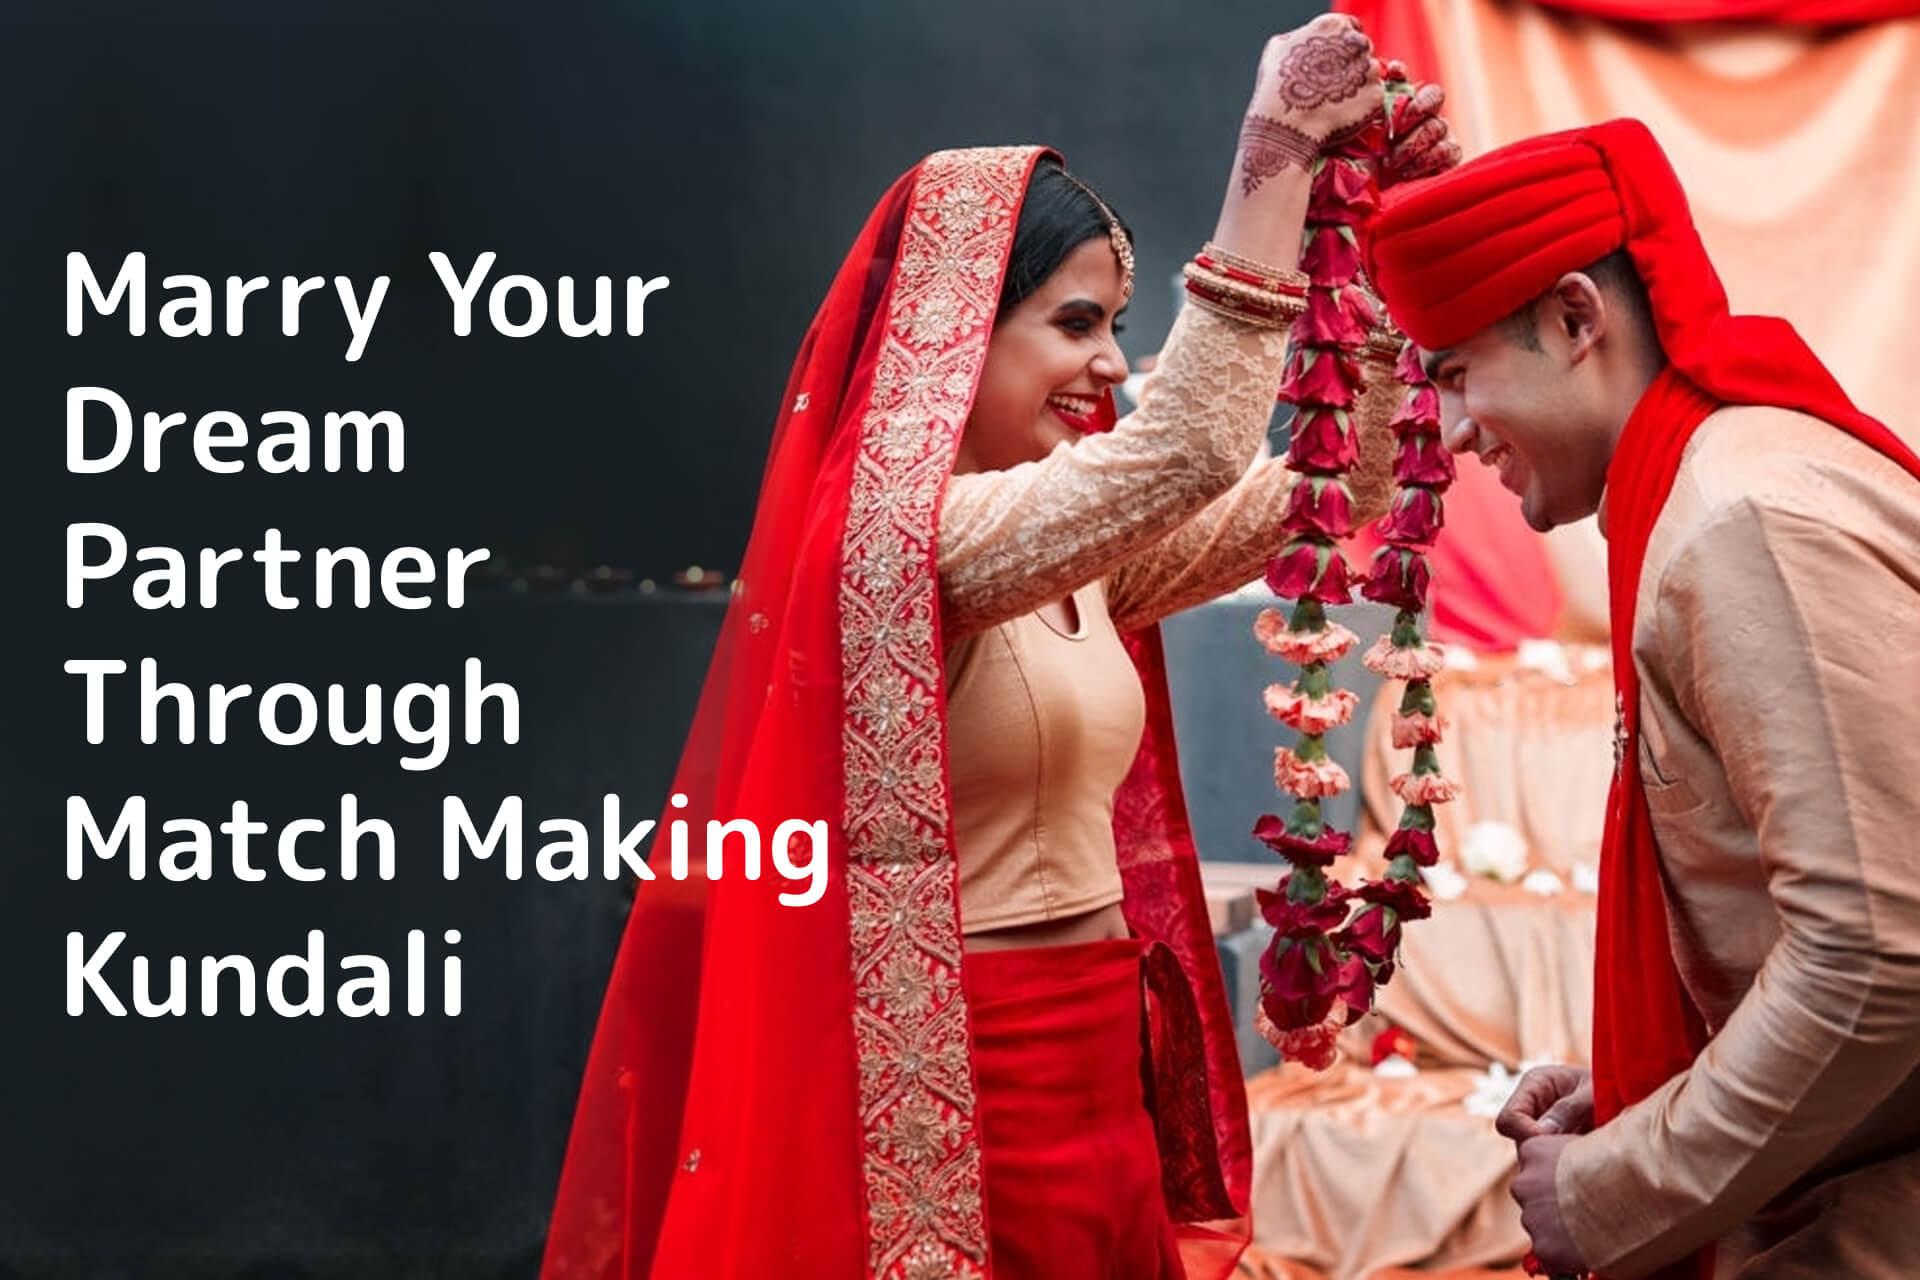 Marry Your Dream Partner Through Match Making Kundali